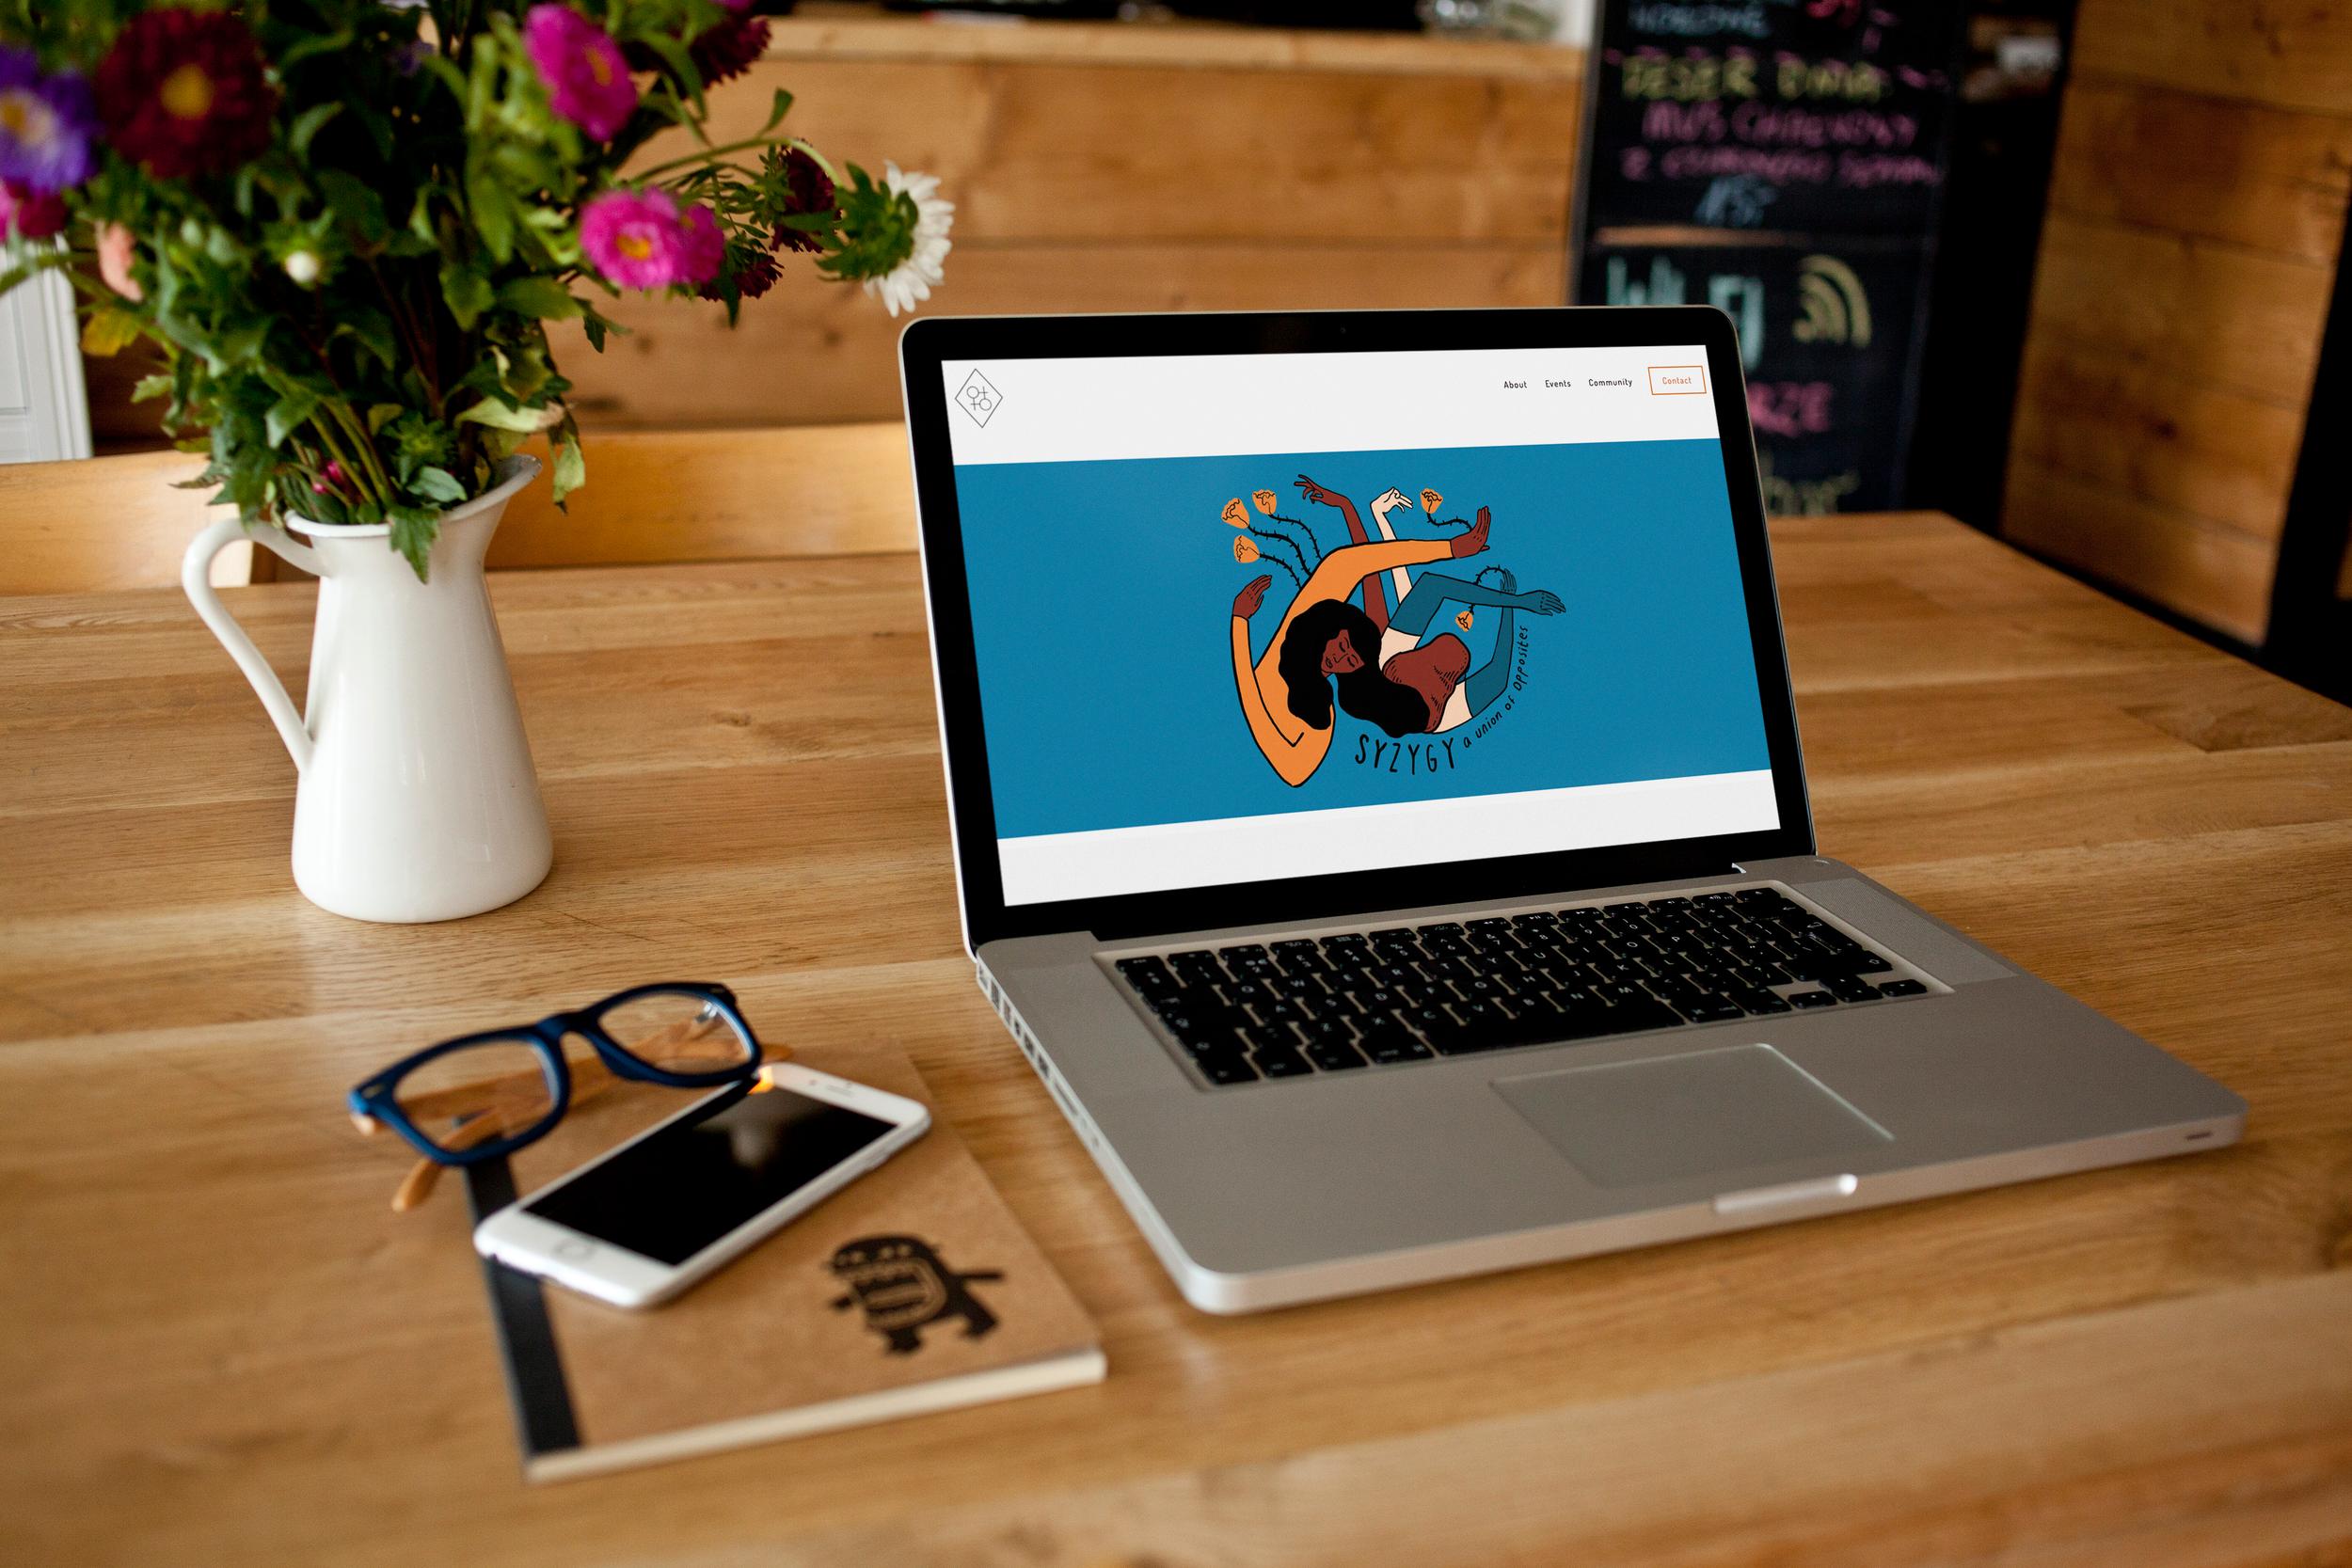 Syzygy's website design